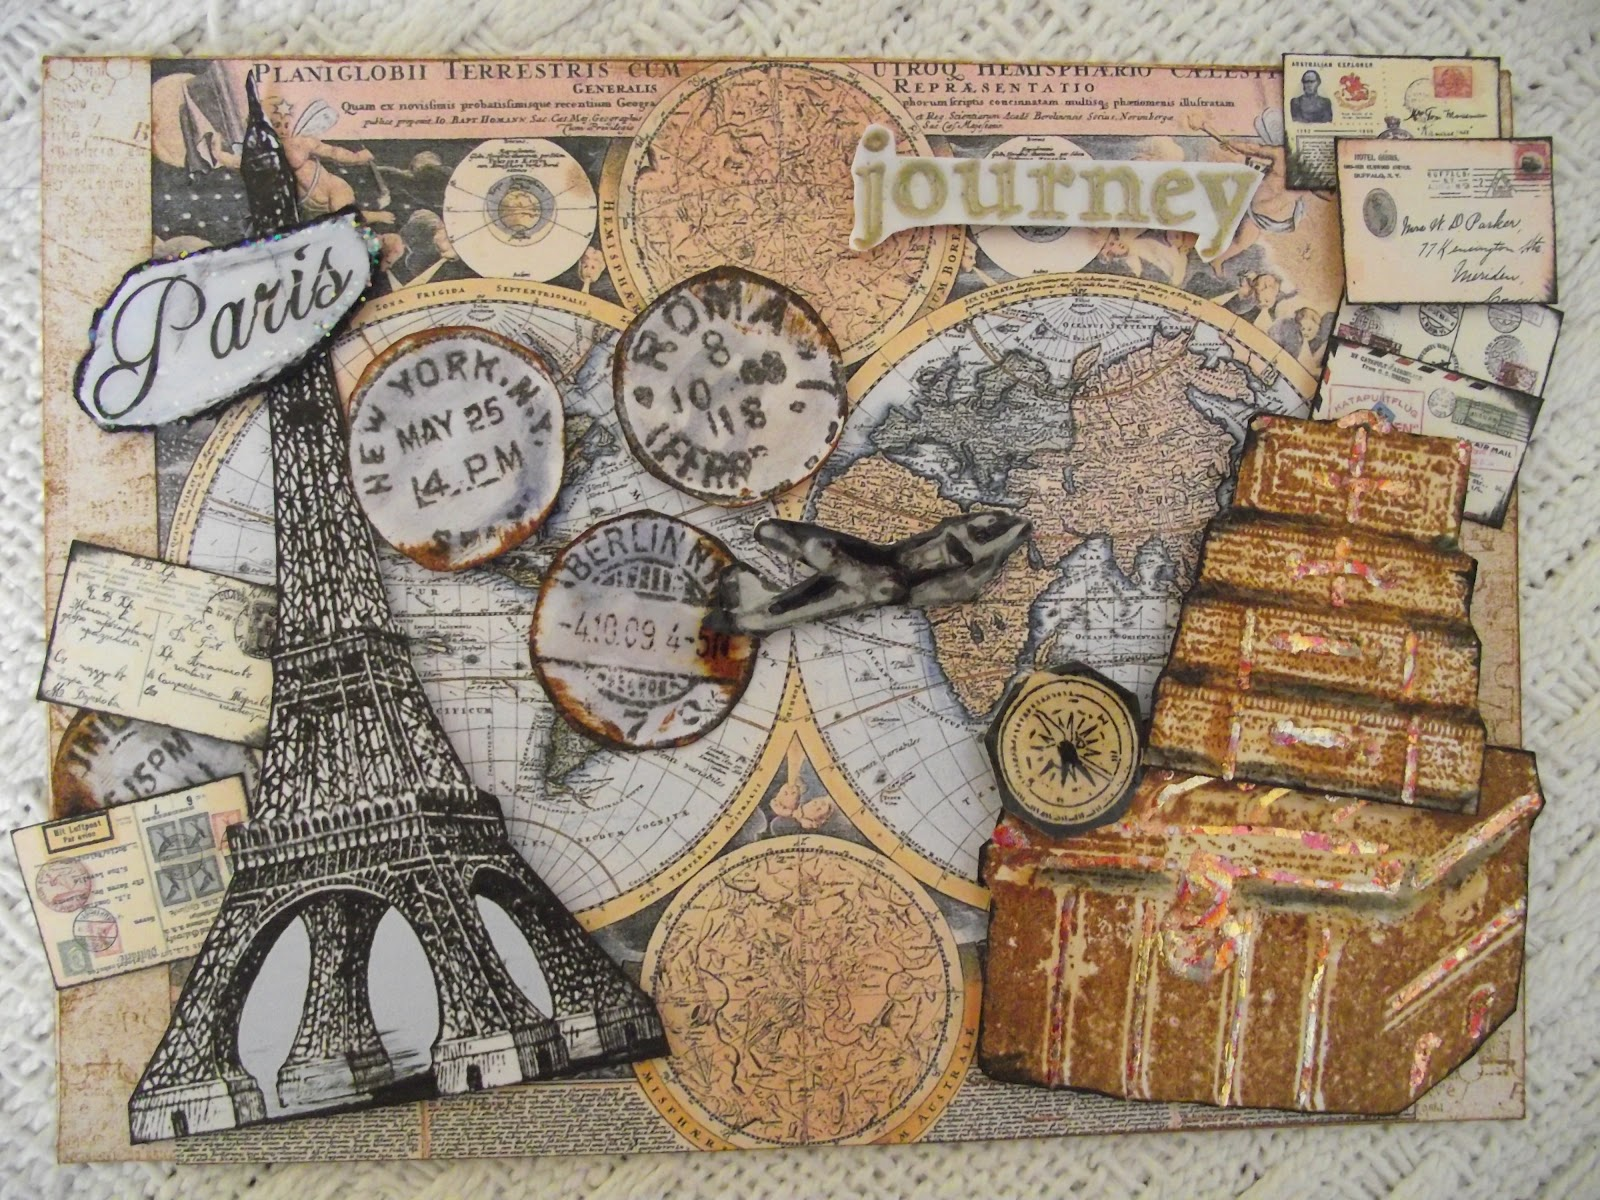 1600x1200px travel themed wallpaper - wallpapersafari